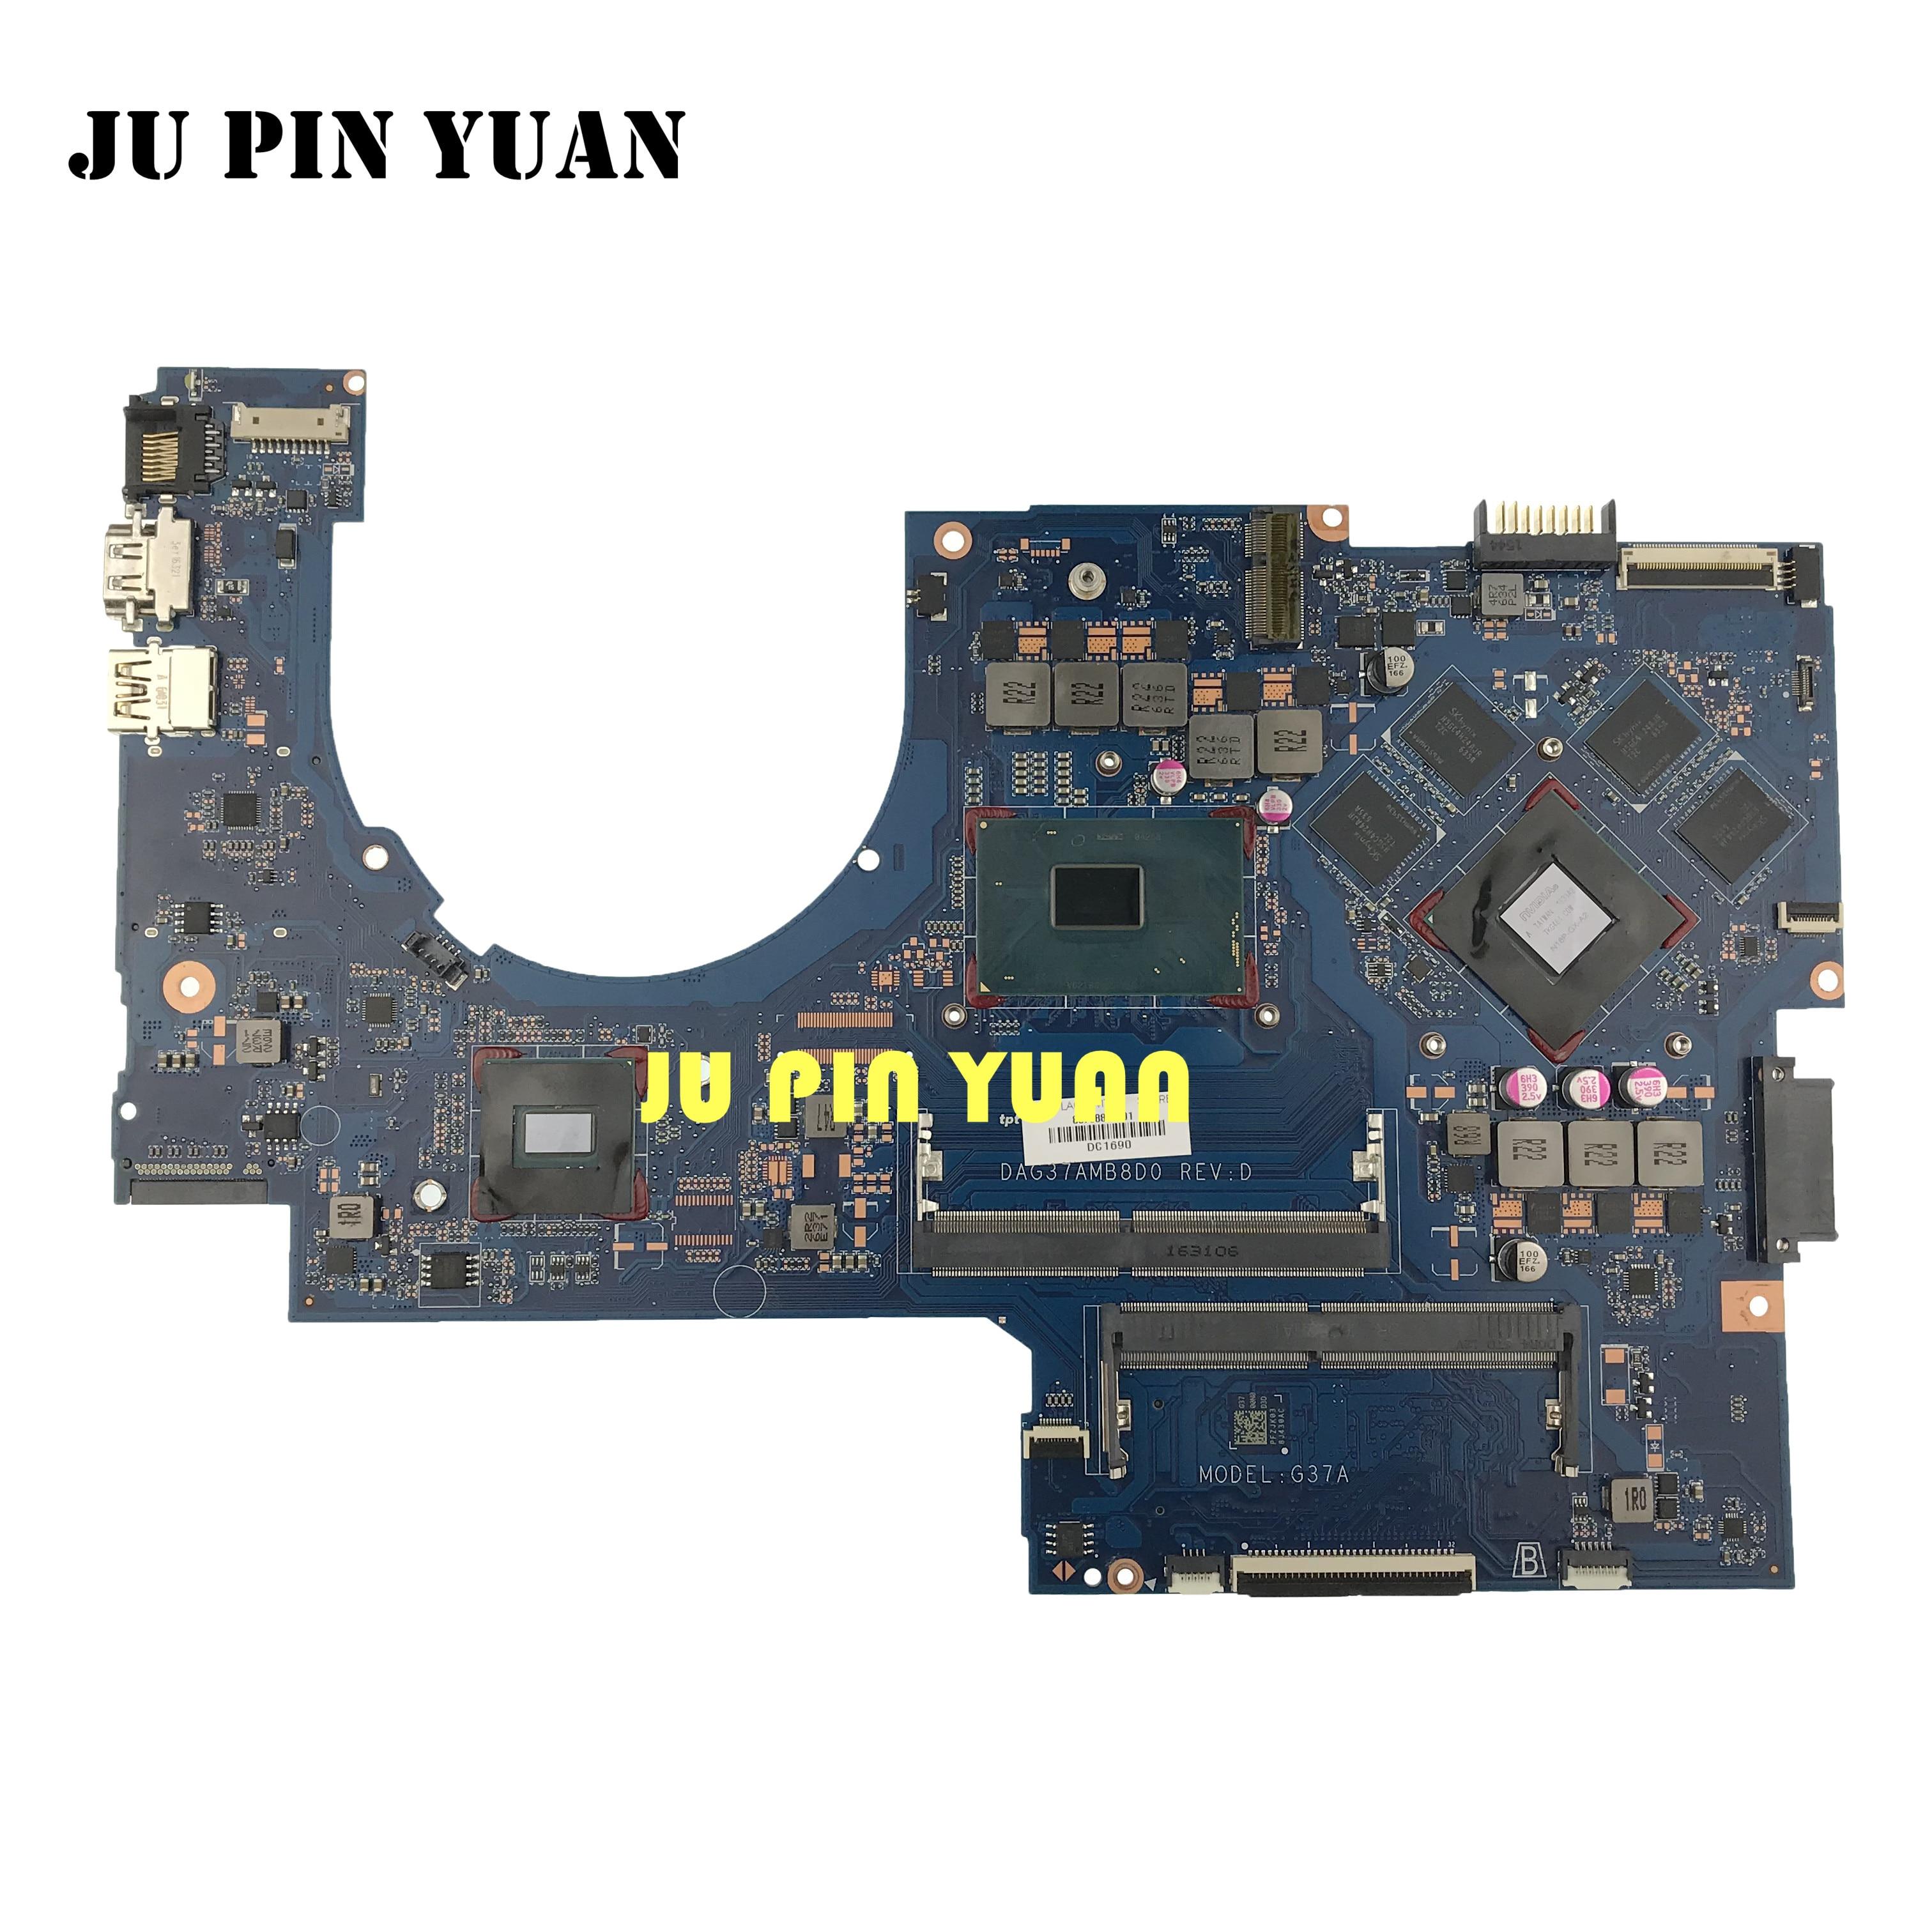 Placa base para ordenador portátil 857389-601 DAG37AMB8D0 G37A para HP PAVILION 17-AB 17-W serie 857389-001 con 960M 2GB i7-6700HQ